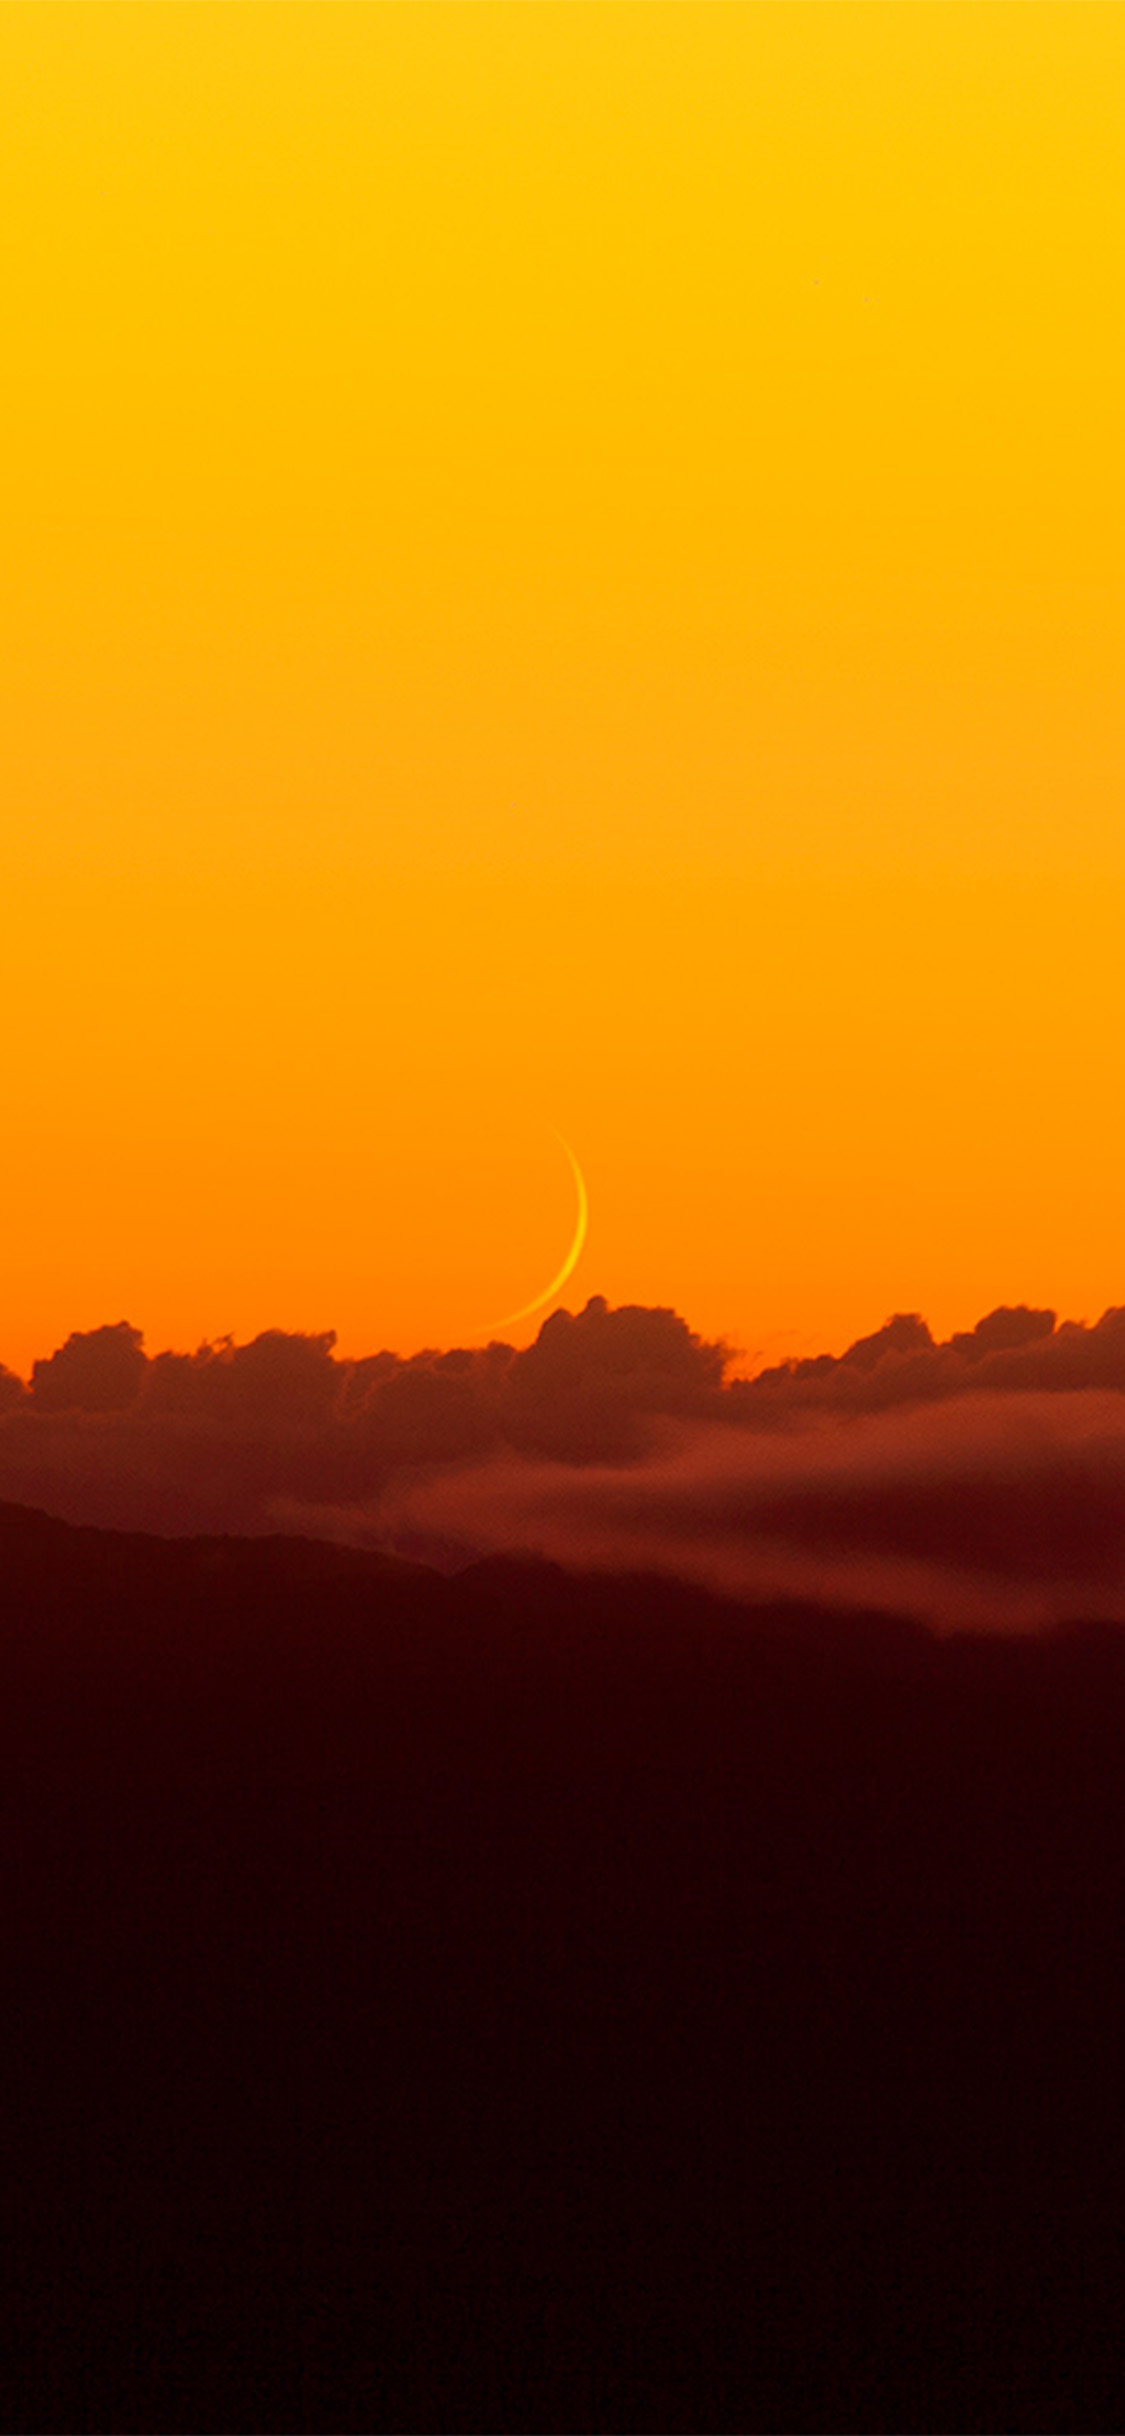 iPhonexpapers.com-Apple-iPhone-wallpaper-nz72-sky-orange-sunset-nature